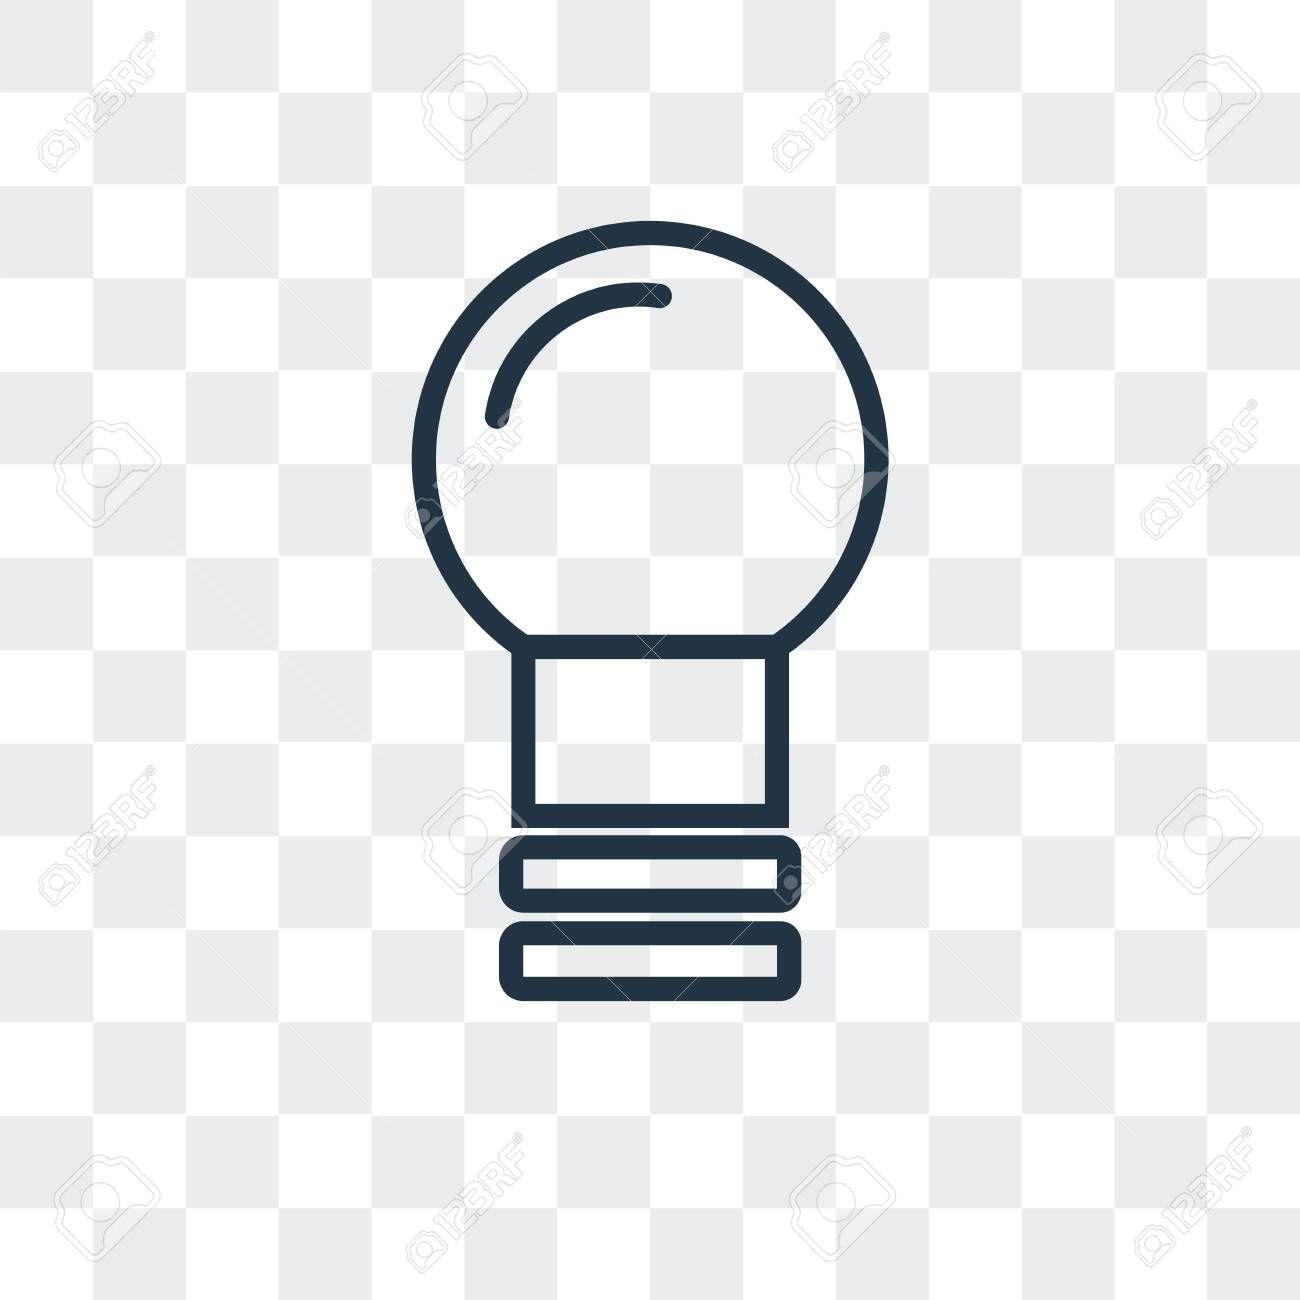 Idea vector icon isolated on transparent background, Idea